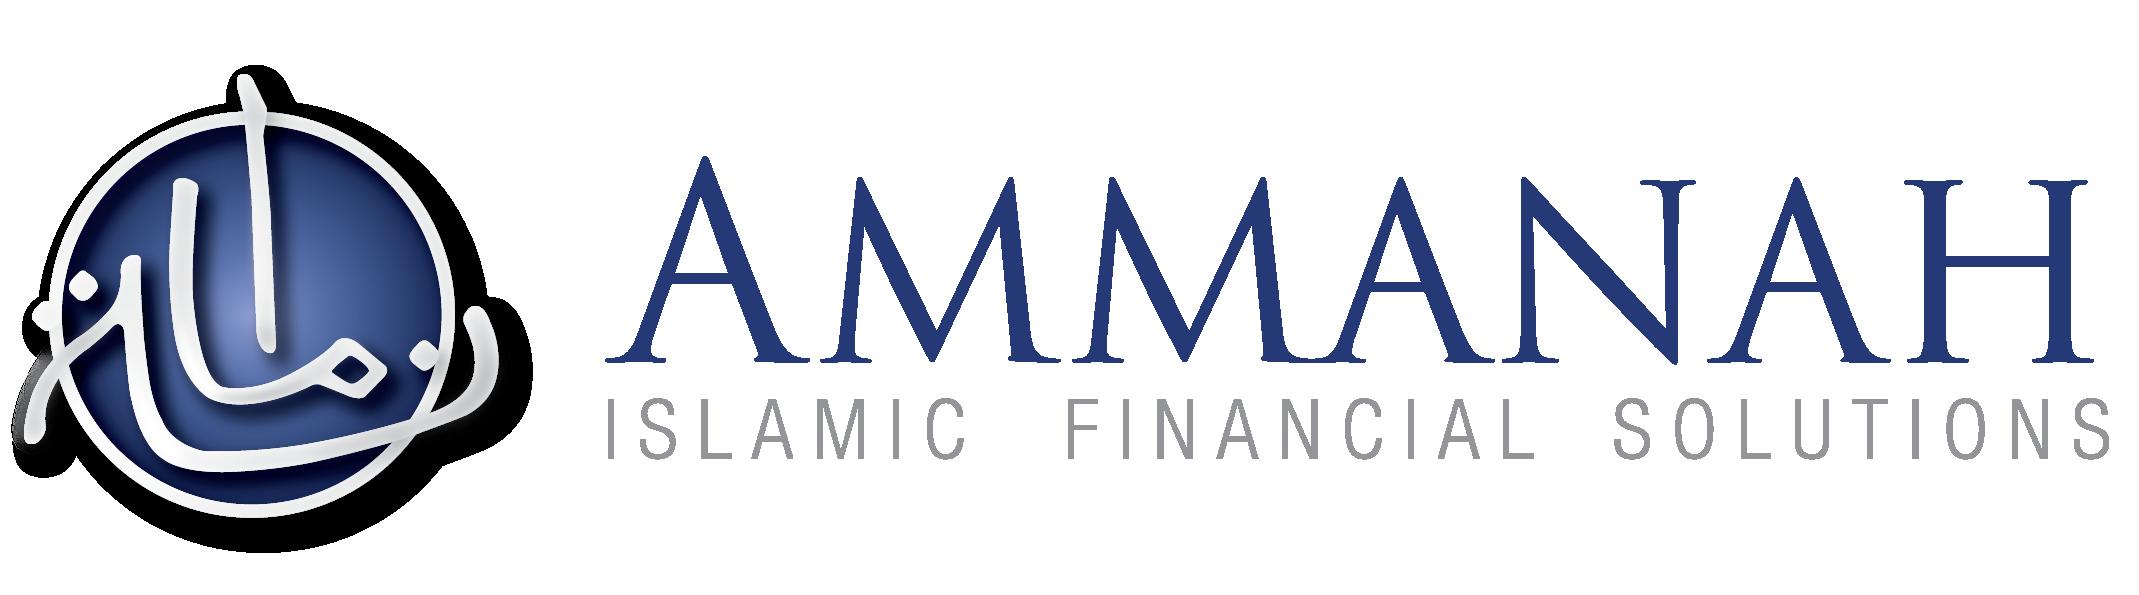 Islamic Financial Solutions